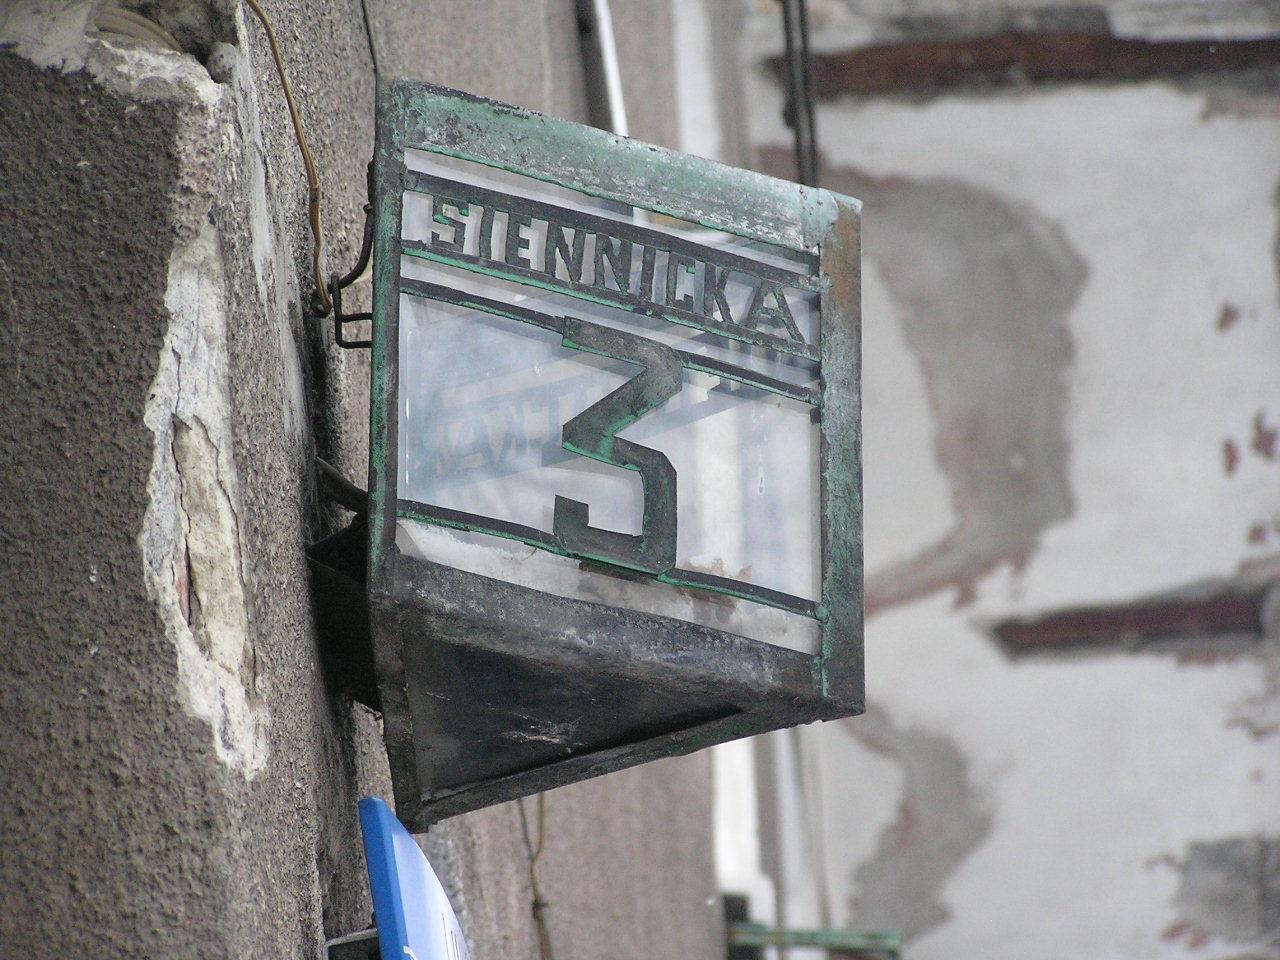 Latarenka adresowa - Siennicka 3